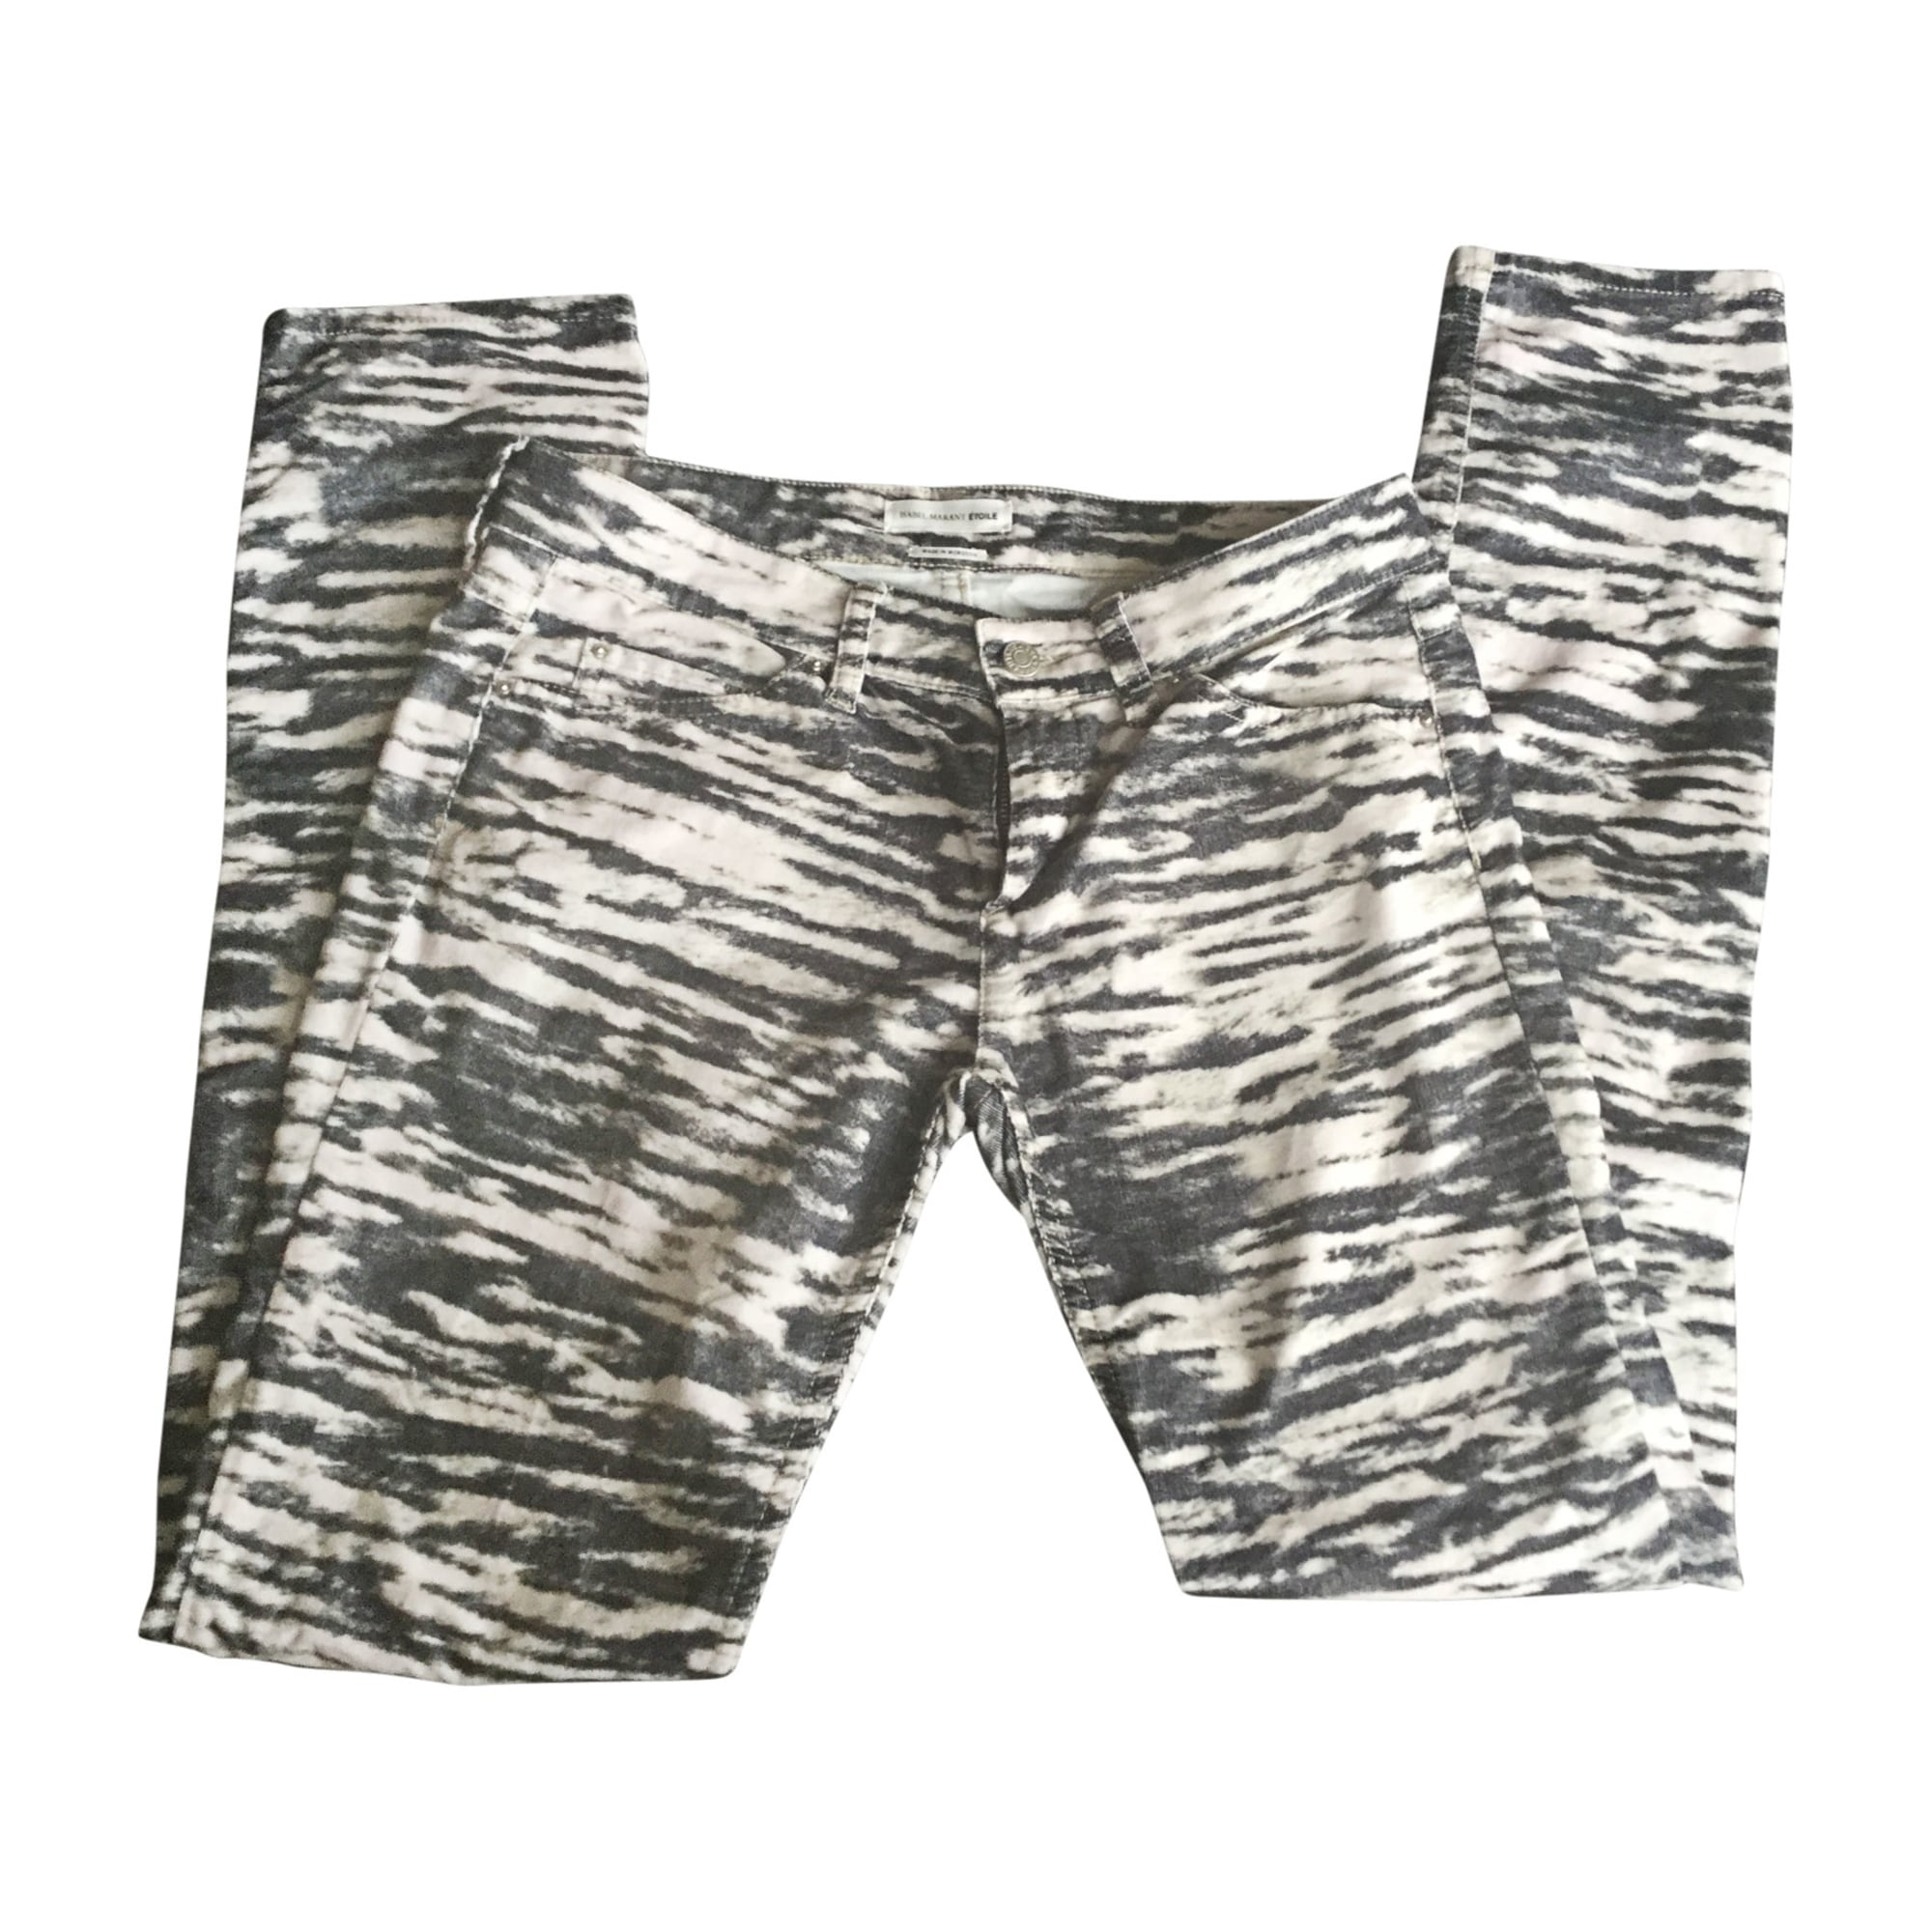 Pantalon droit ISABEL MARANT ETOILE Imprimés animaliers